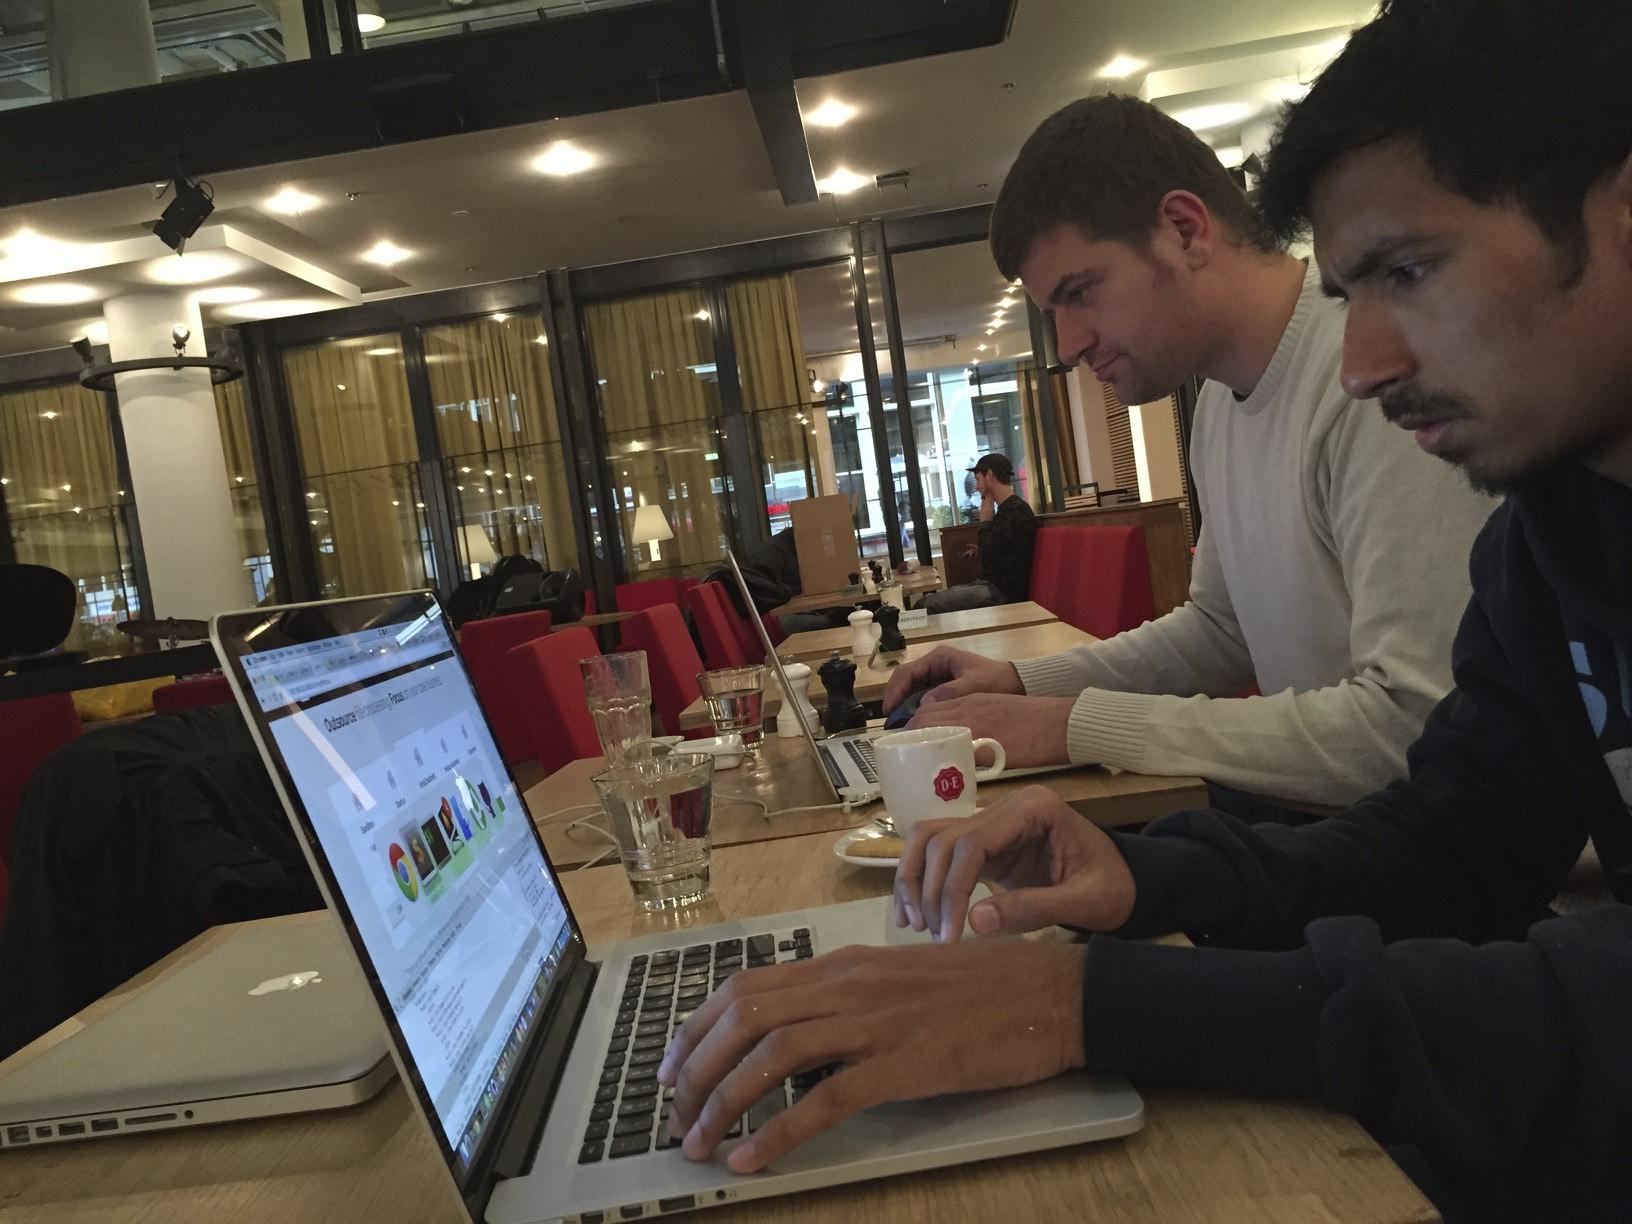 Amsterdam Shiny Hacking Trip November 2015